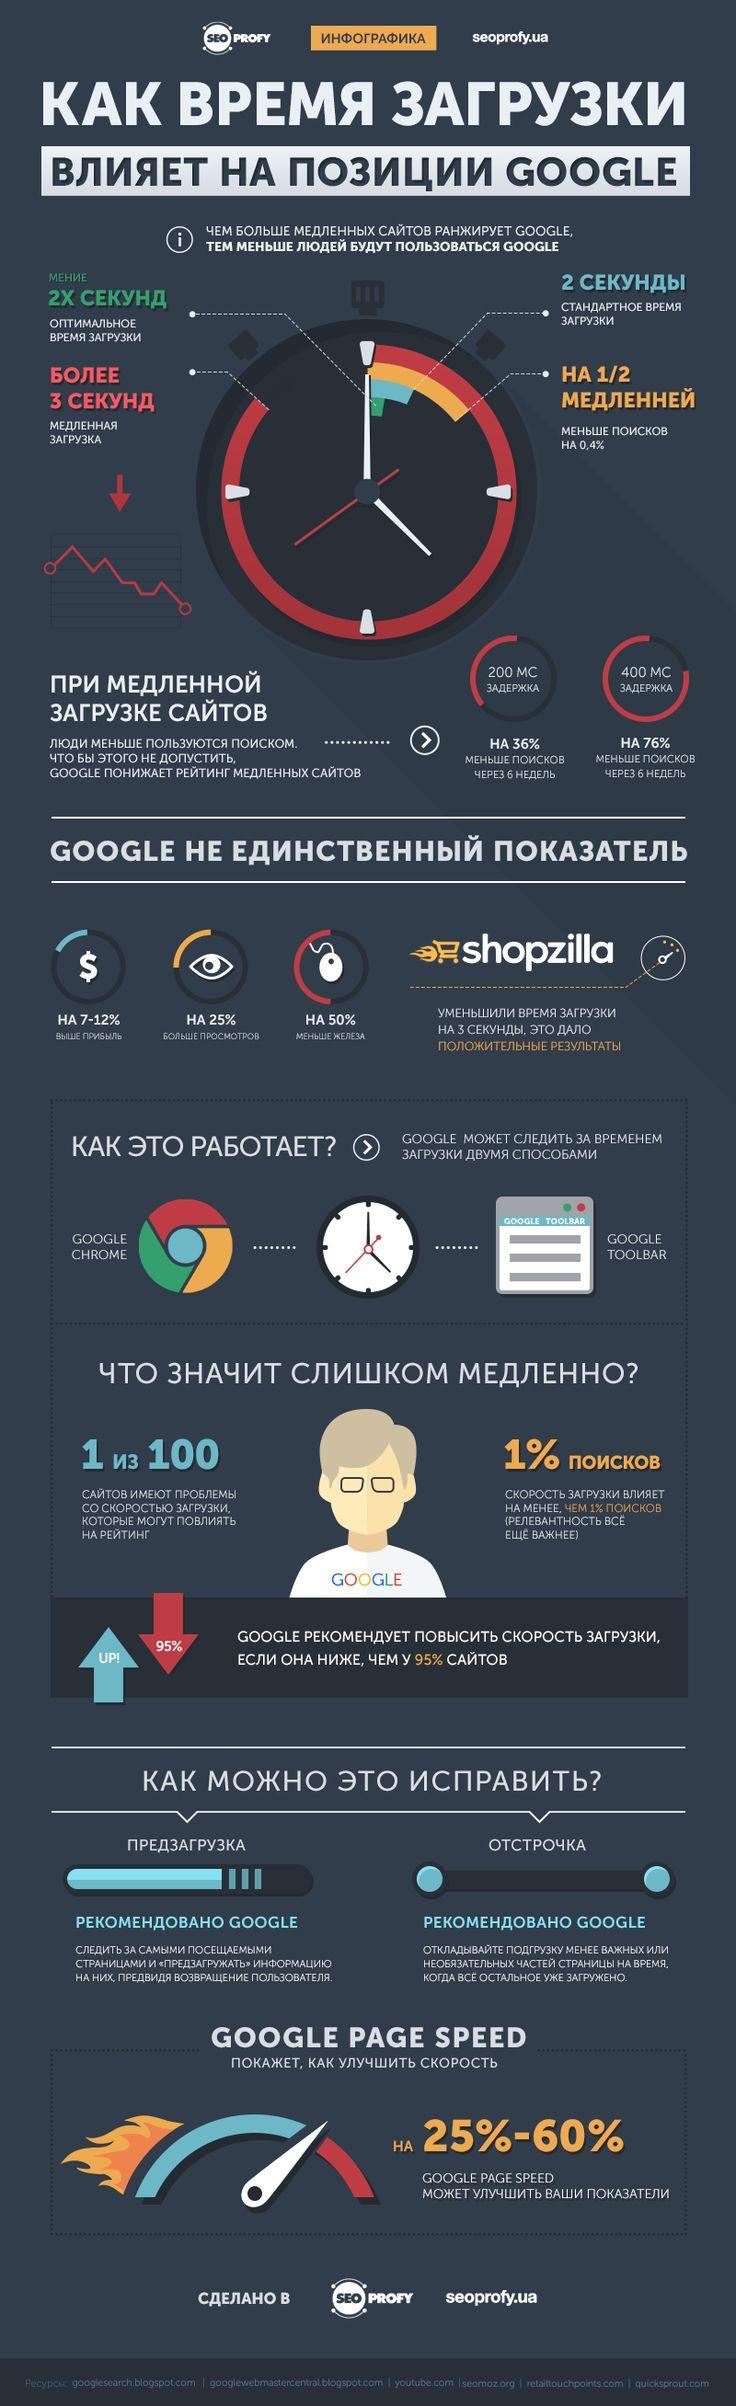 http://seoprofy.ua/wp-content/uploads/2014/05/skorost-zagruzki-seoprofy-infographic.png